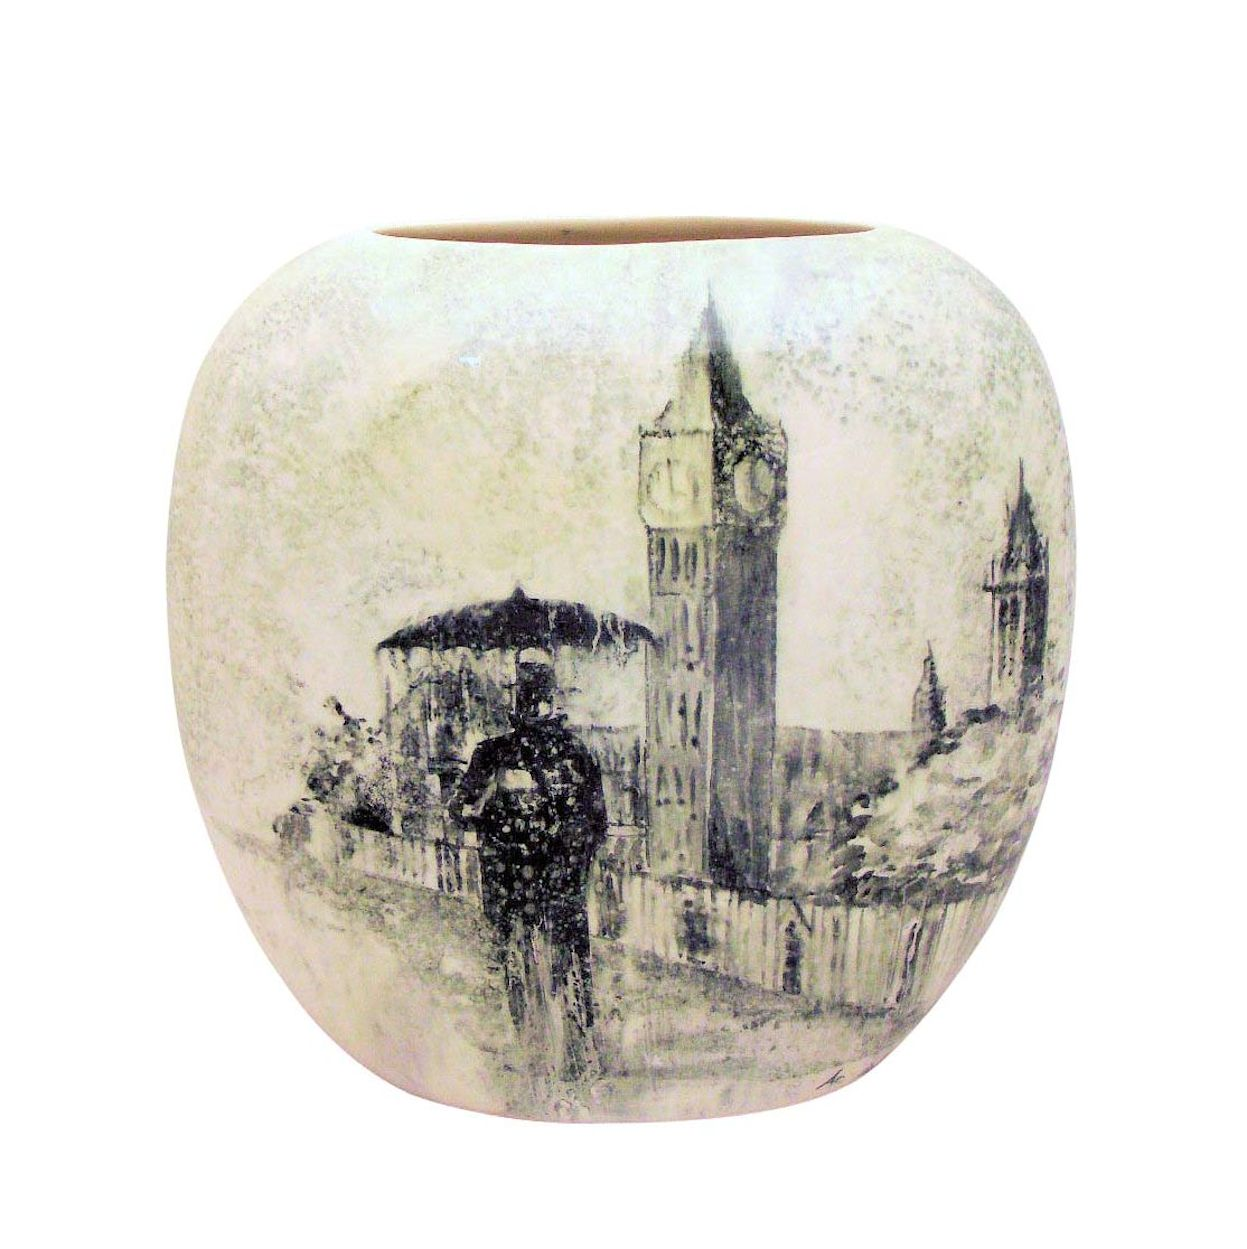 Carlton Ware Rain Man Study Design Stoke Art Pottery